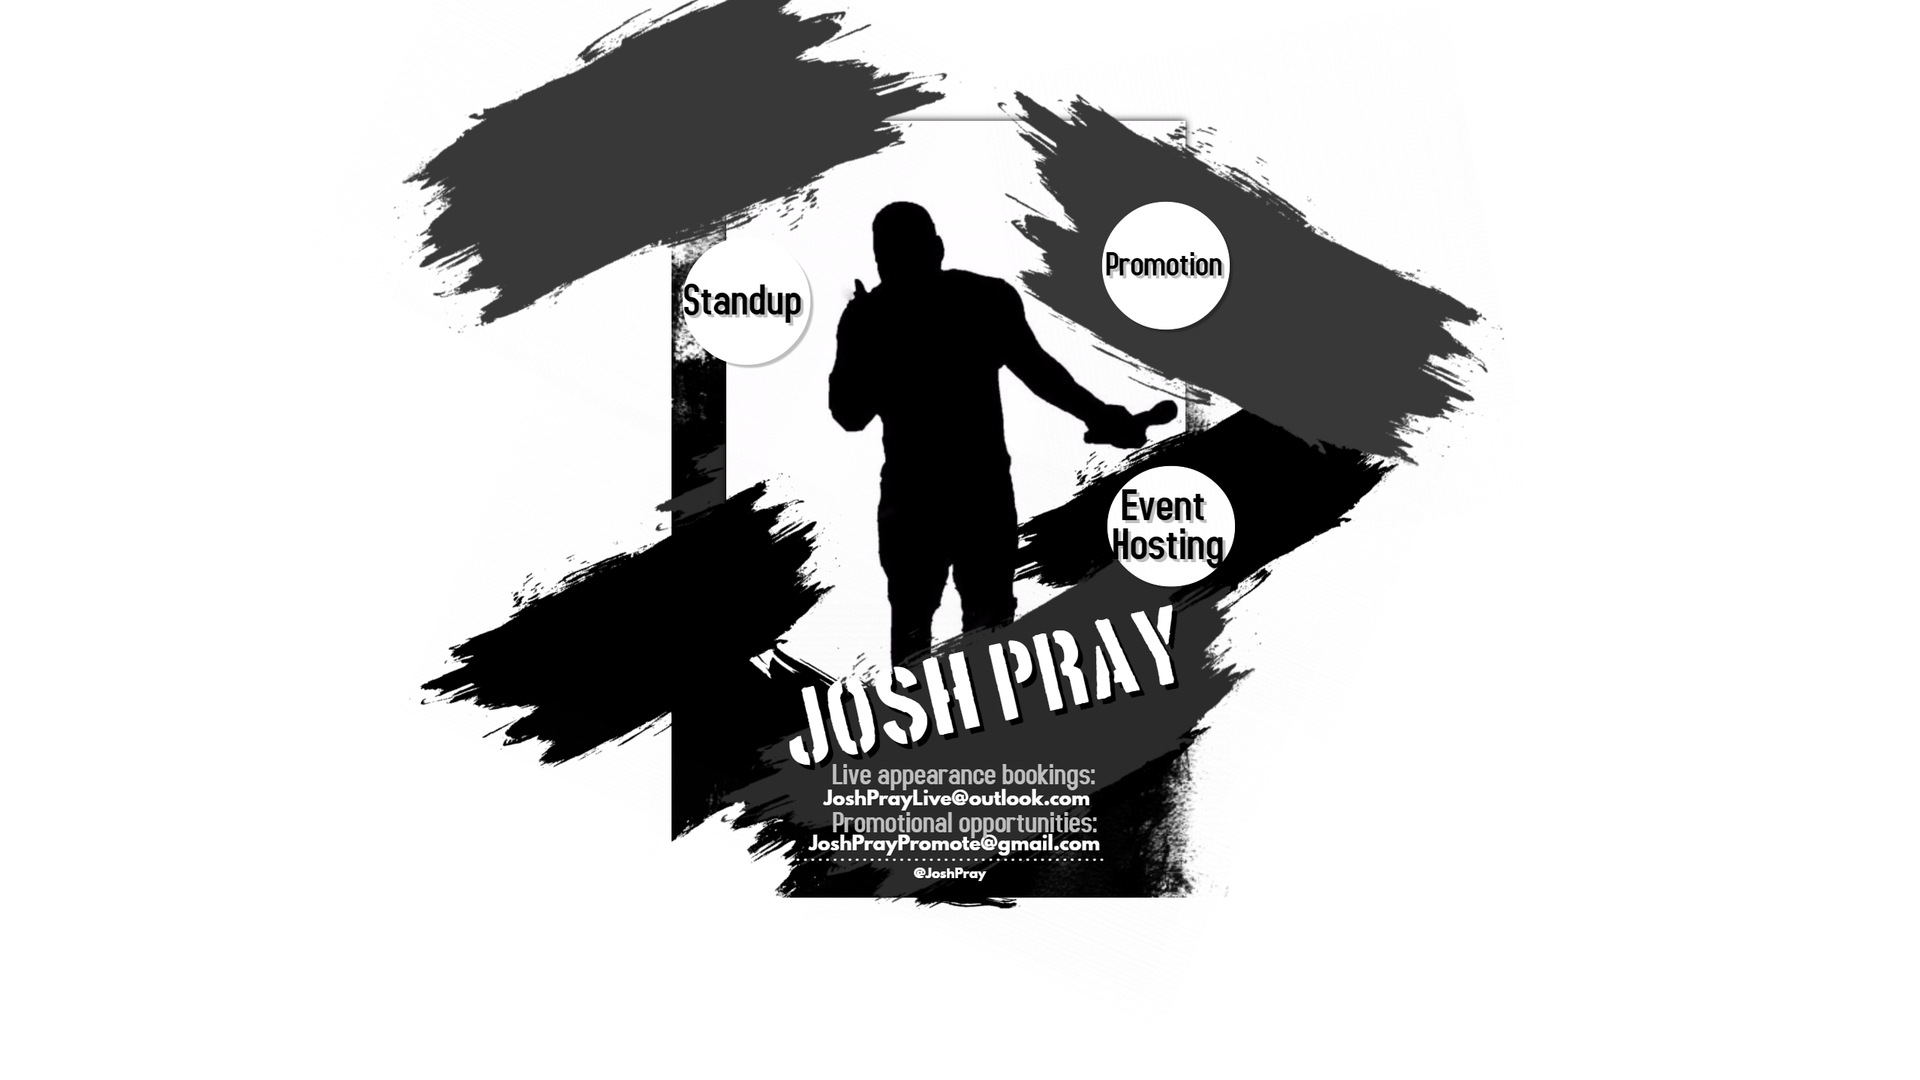 JOSH PRAY ENTERTAINMENT- Official Merchandise Store